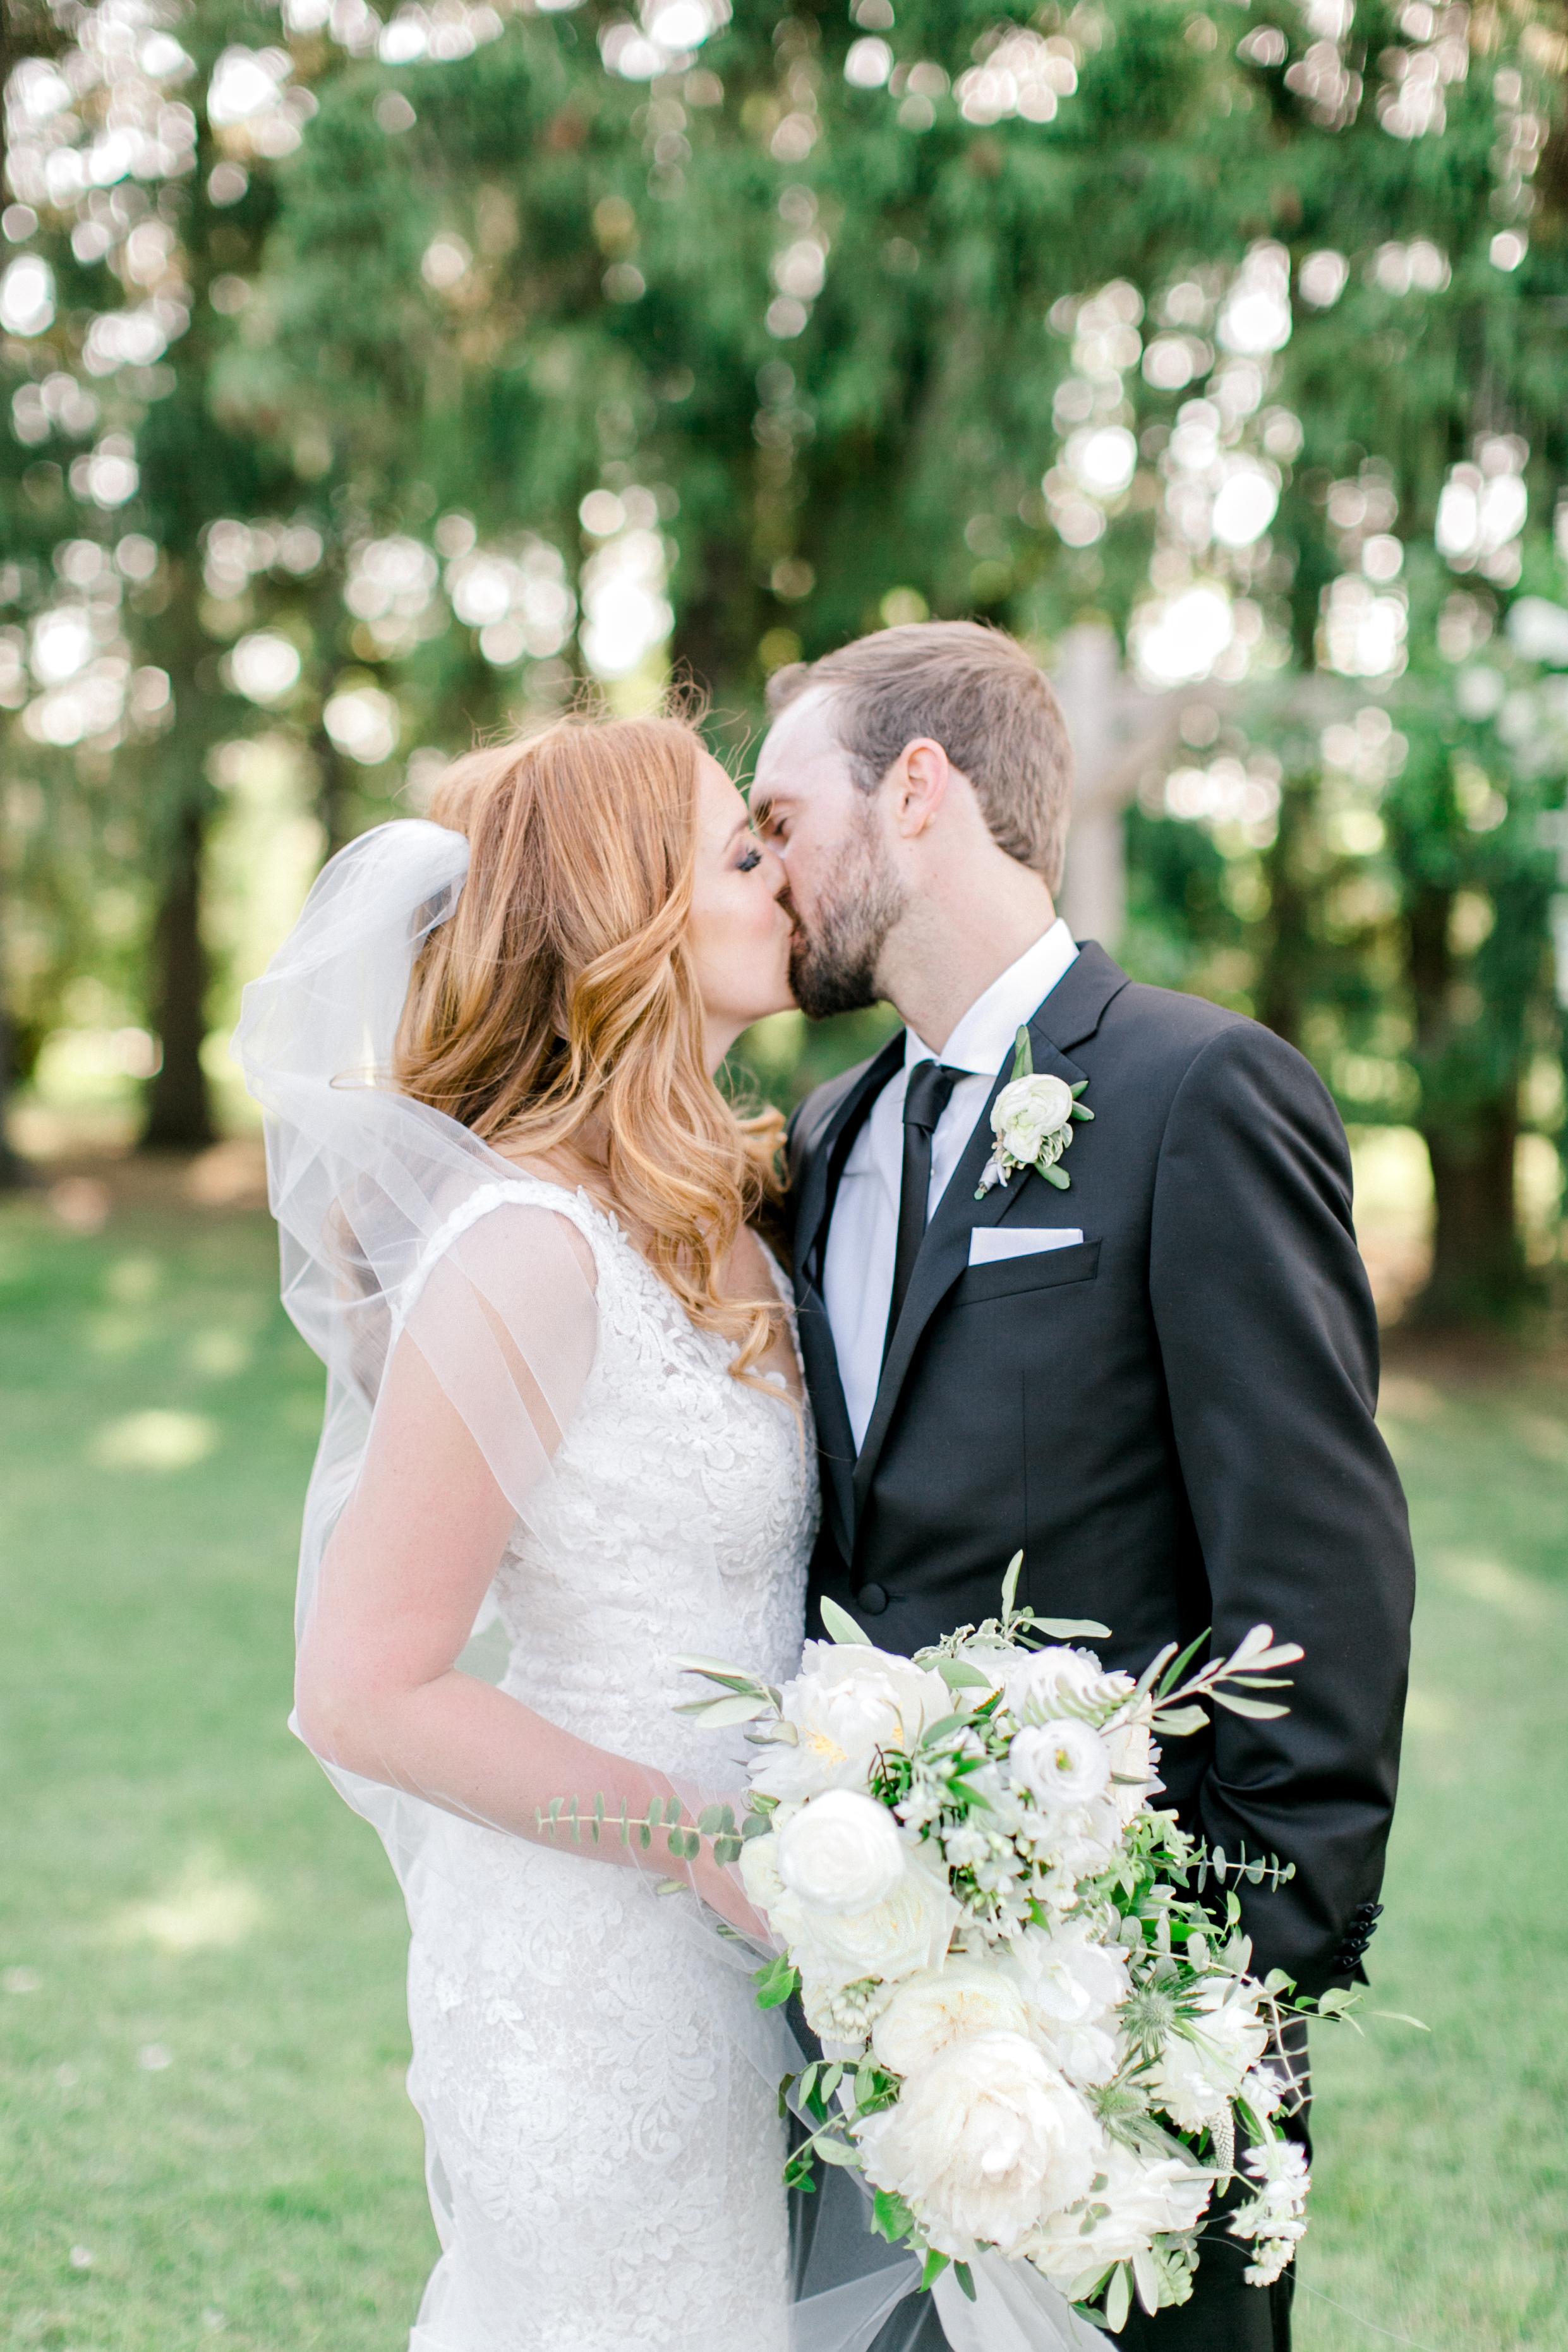 cambium-farms-kurtz-wedding-toronto-photographer-langdon-film-richelle-hunter-cori-joey-previews-9.jpg